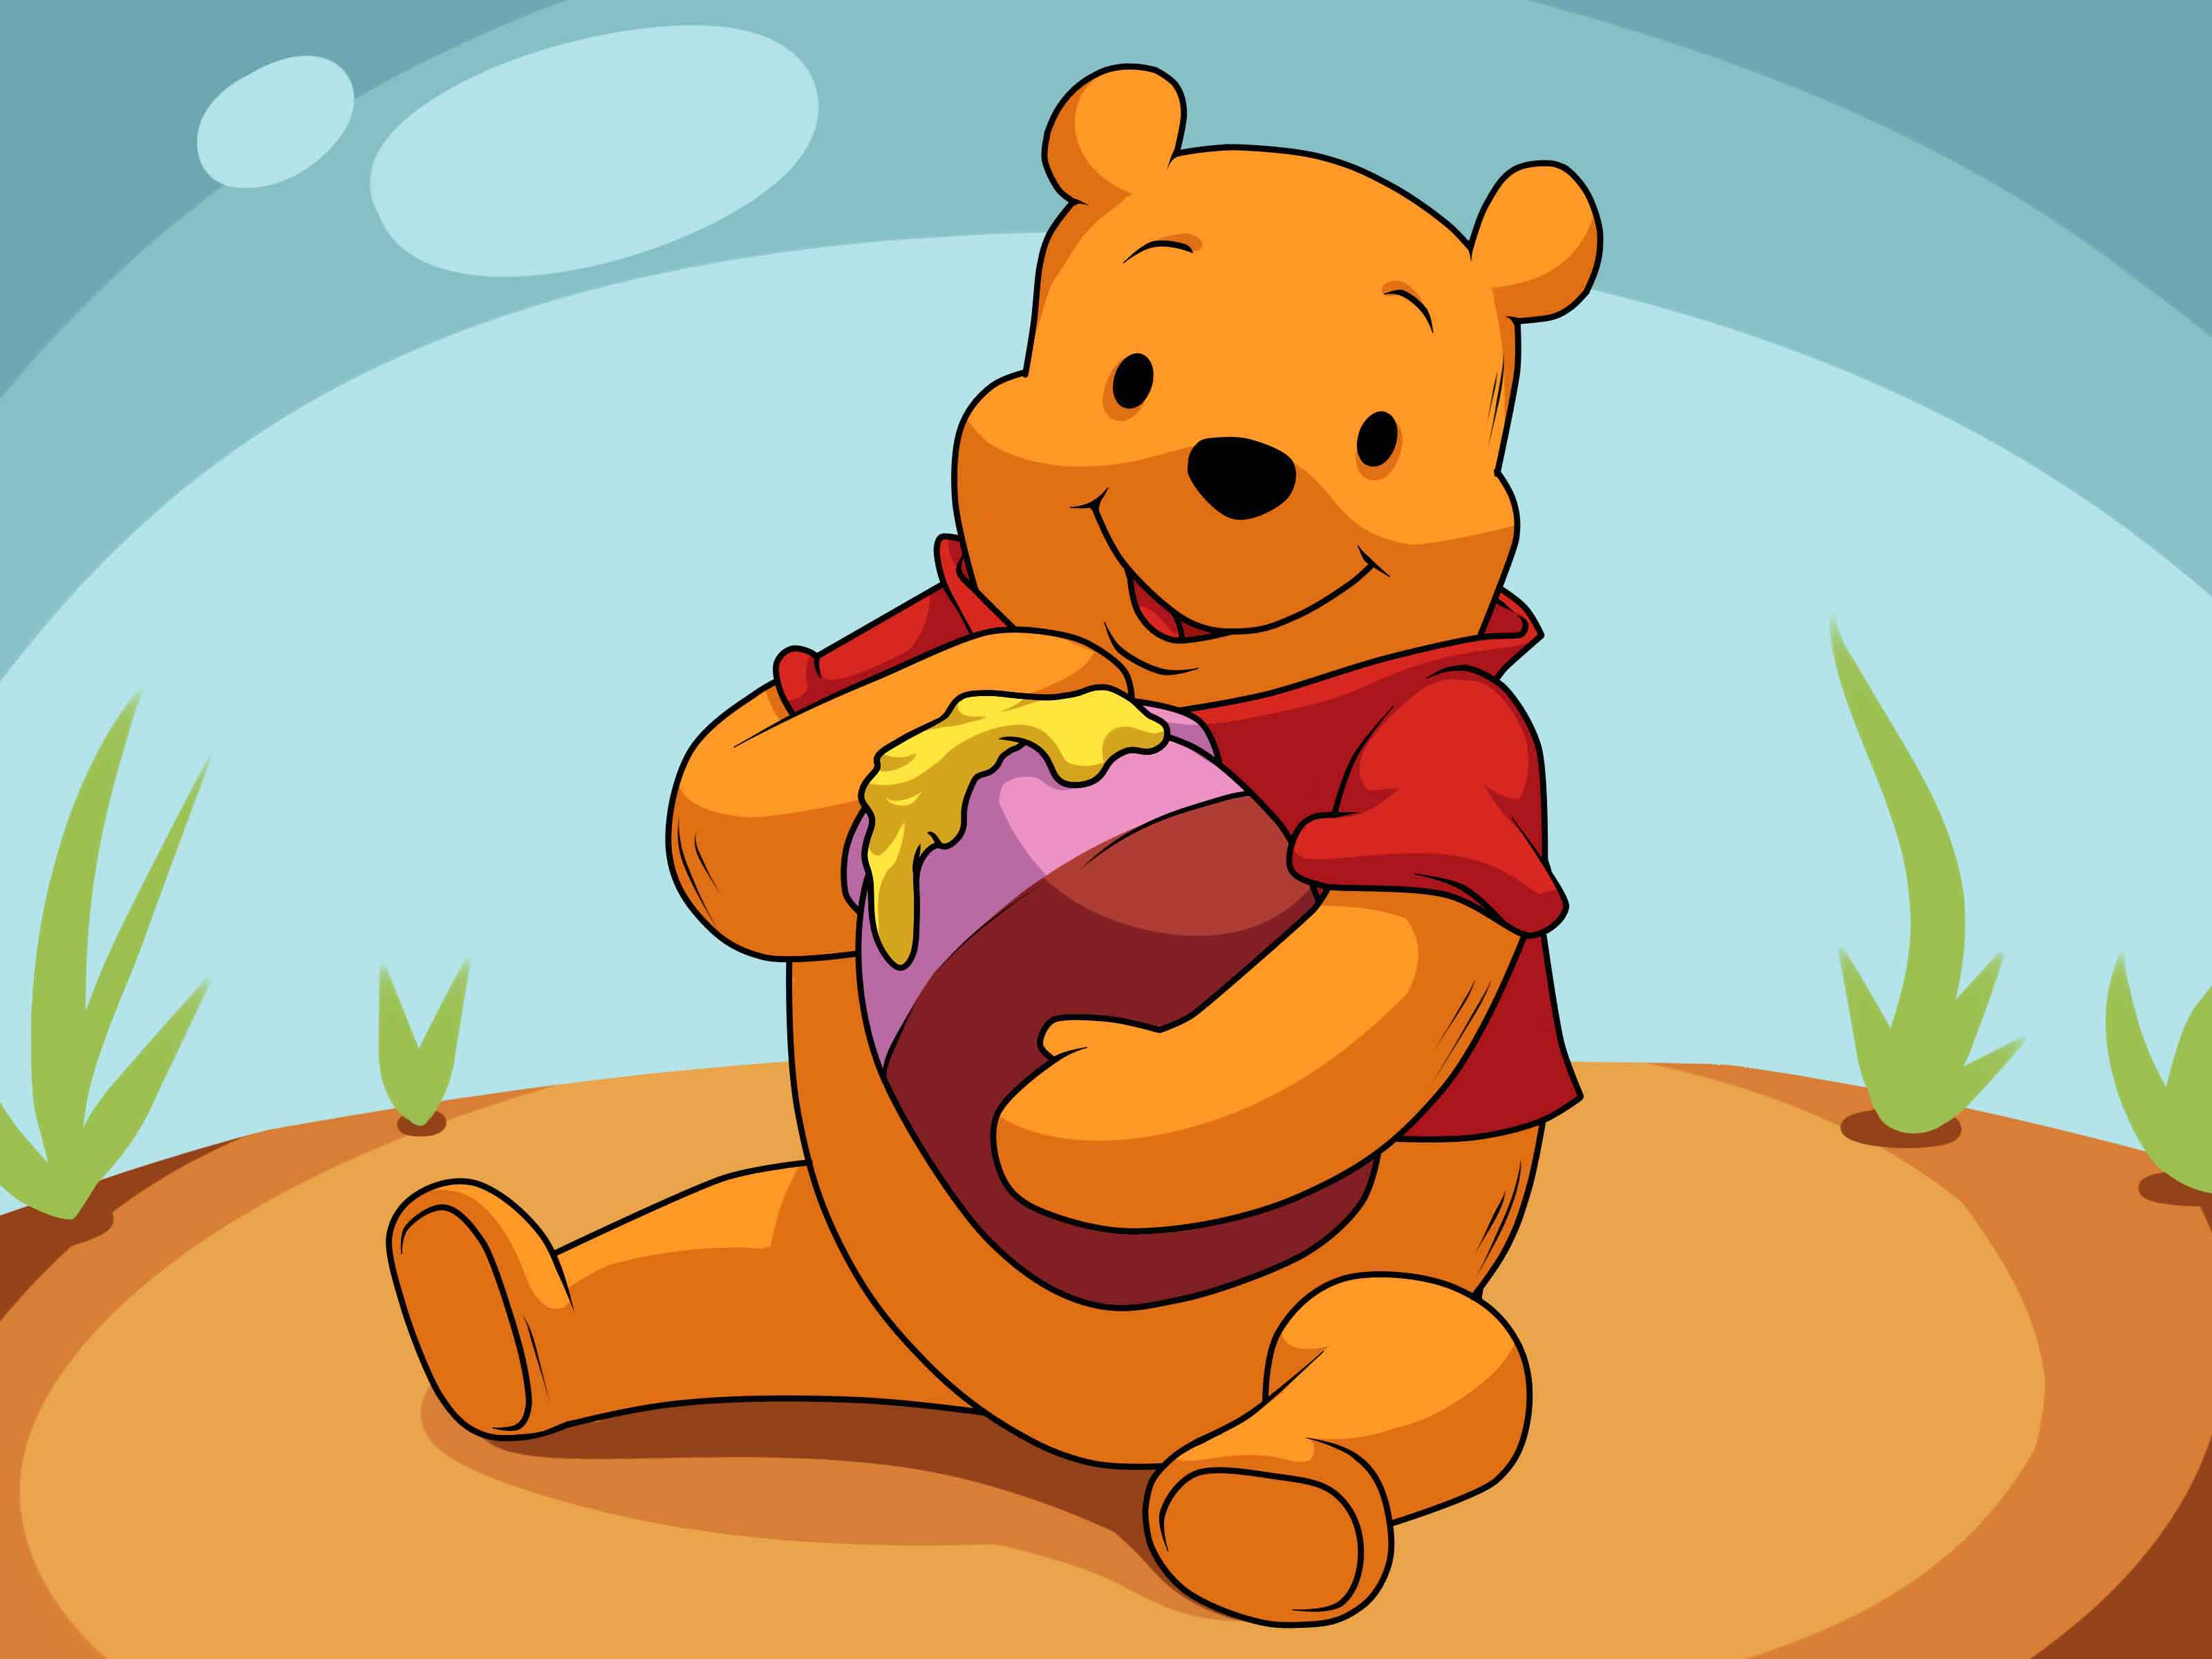 Winnie the Pooh itu laki-laki atau perempuan?